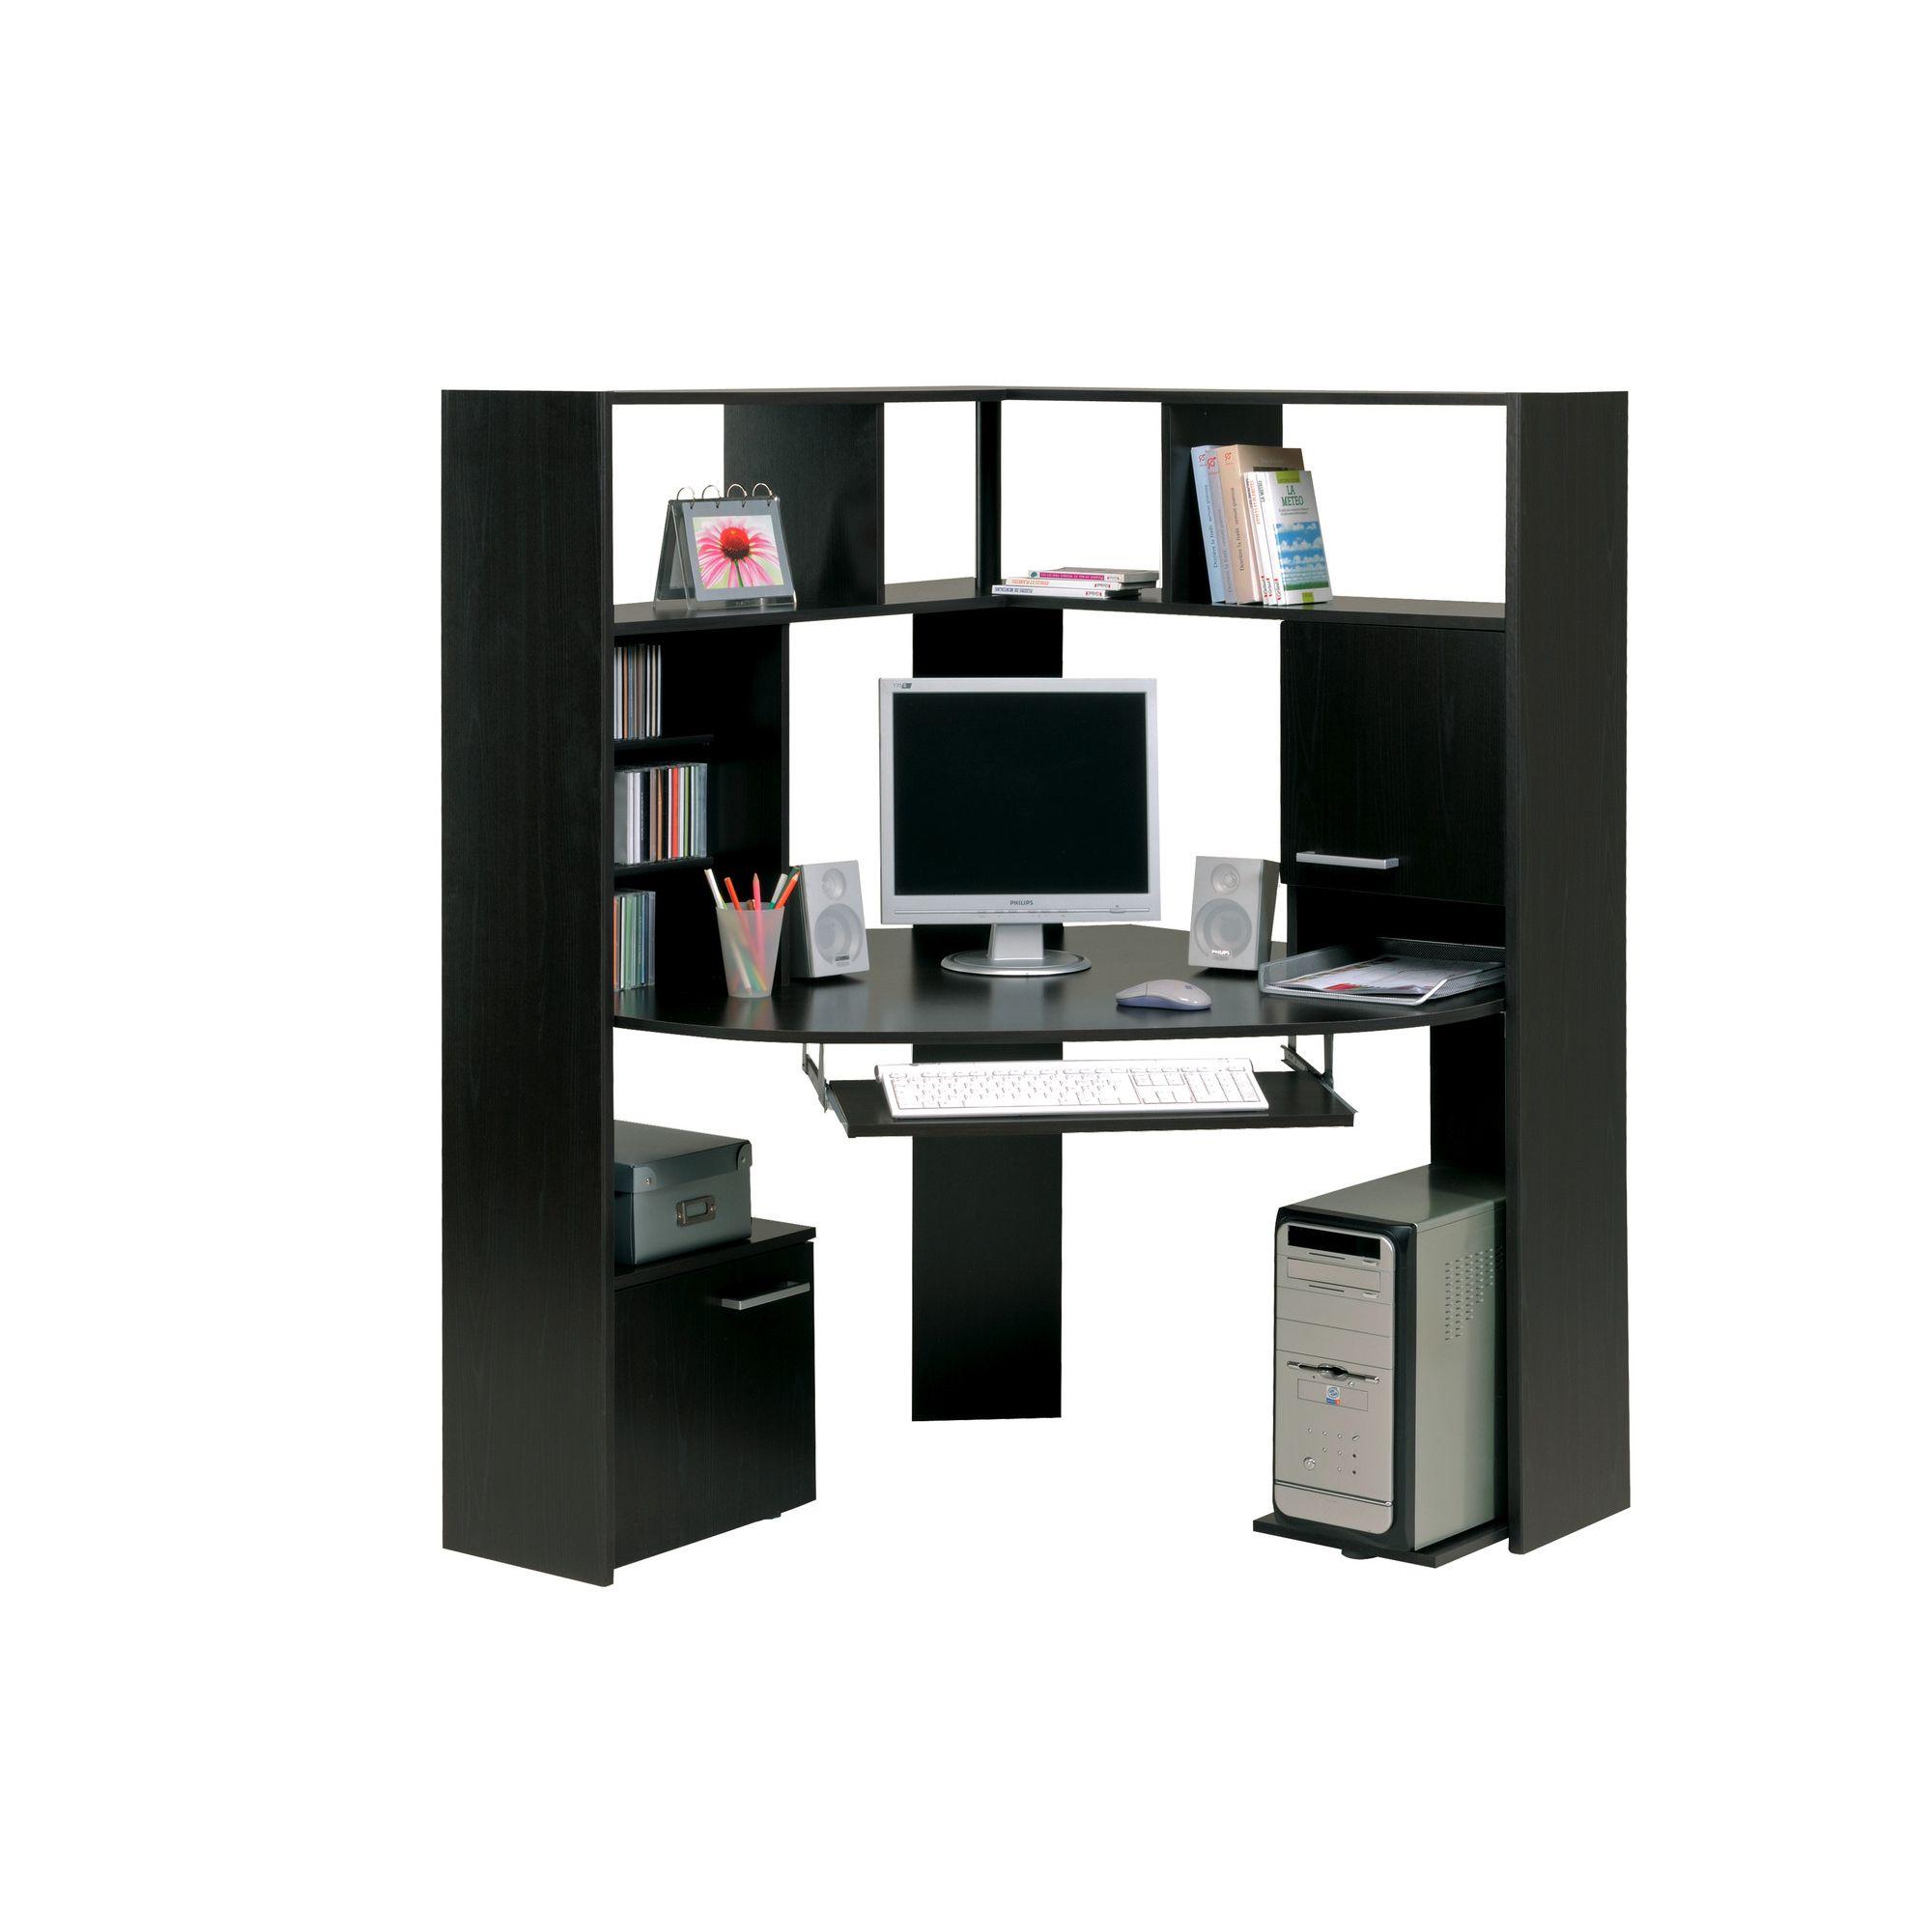 Parisot Hubble Corner Computer Desk in Wenge at Tescos Direct